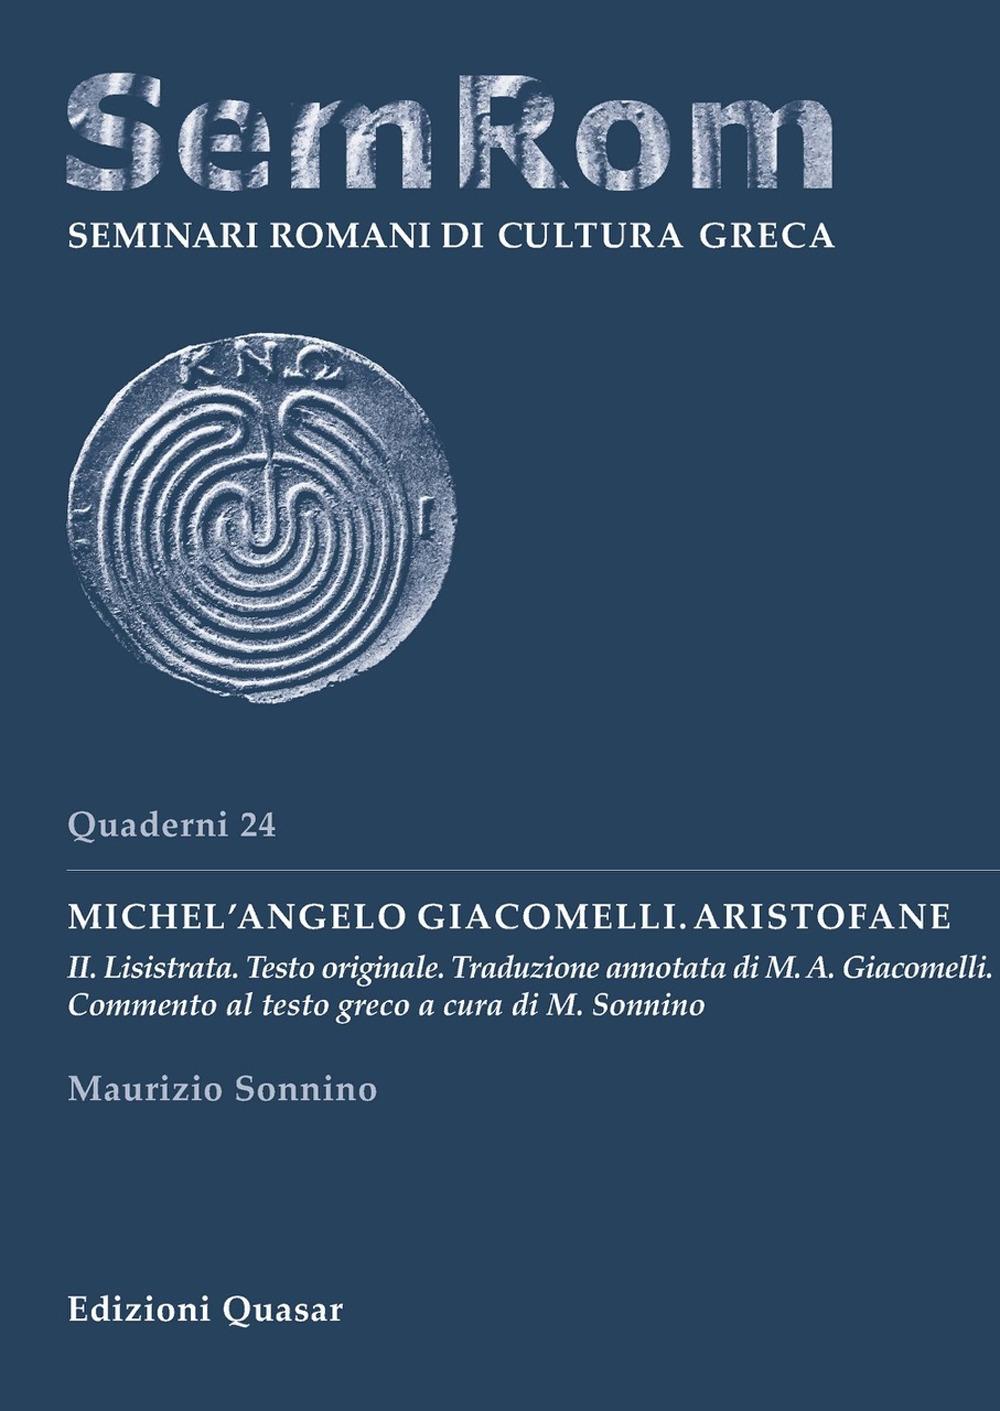 Michel'Angelo Giacomelli. Aristofane. Vol. 2: Lisistrata